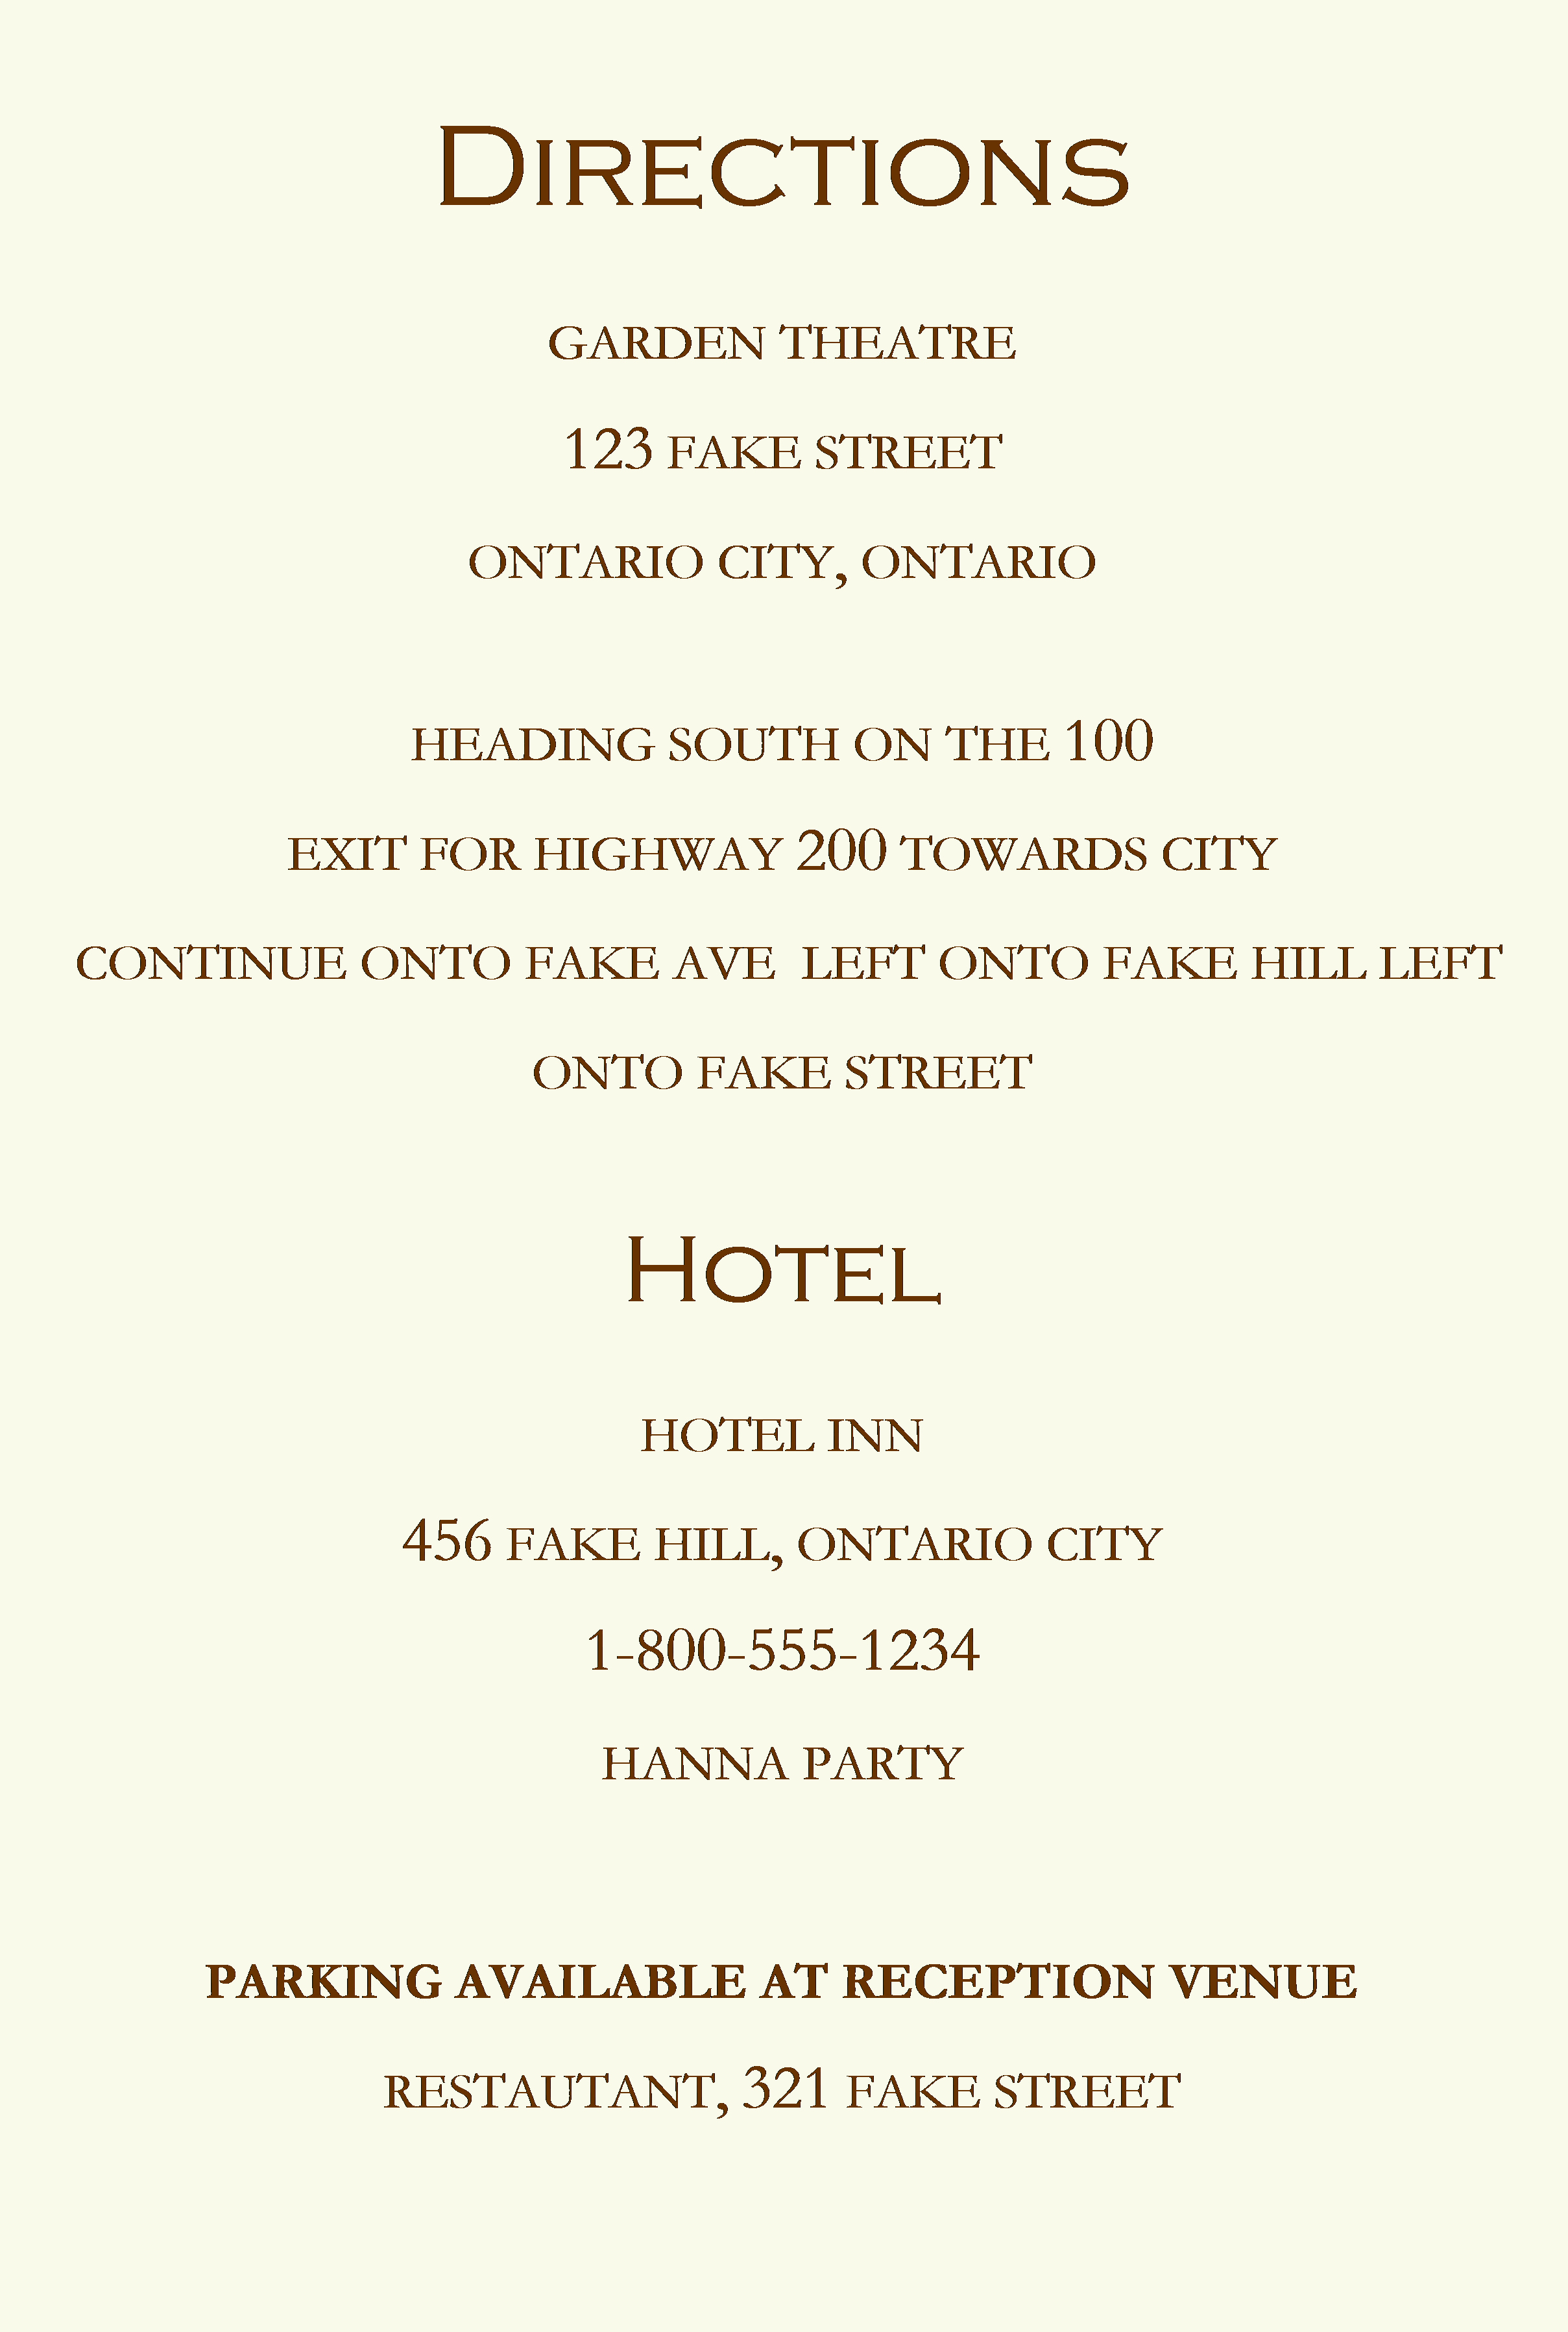 Direction Card Template Microsoft Word Beautiful Wedding Planning Viii Wedding Invitations sophster toaster